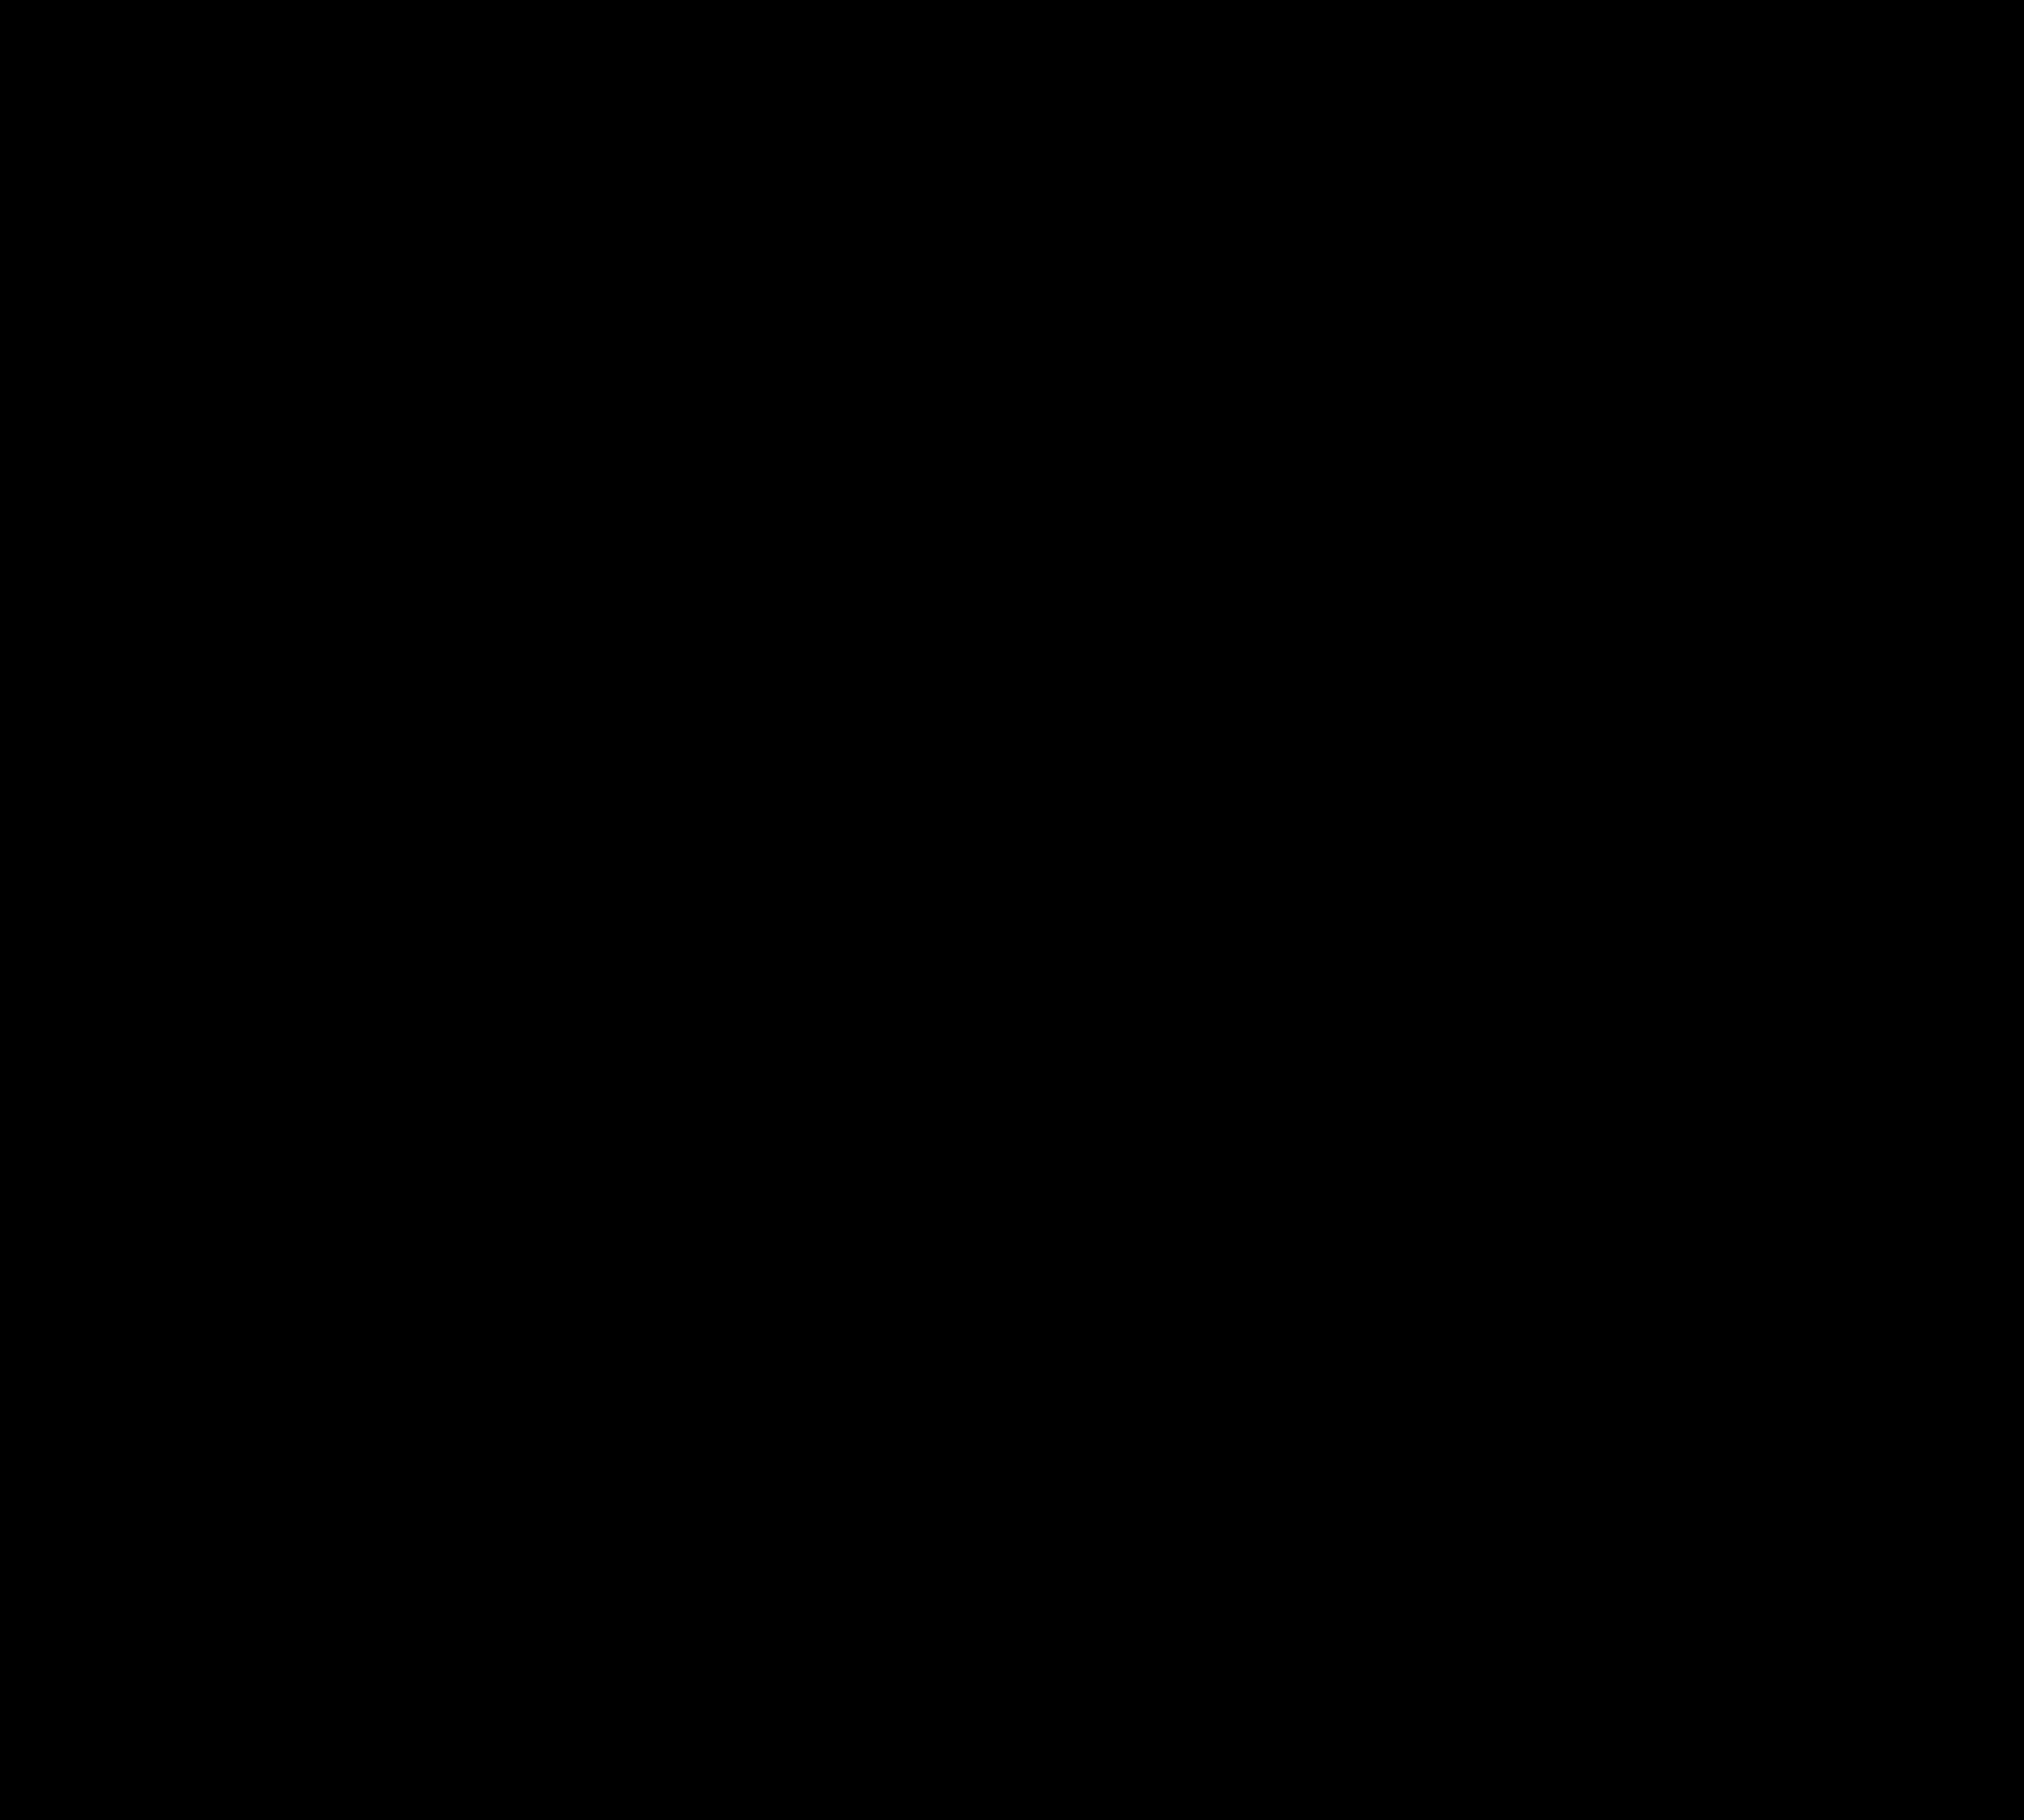 20th-century-fox-logo-png-transparent.png